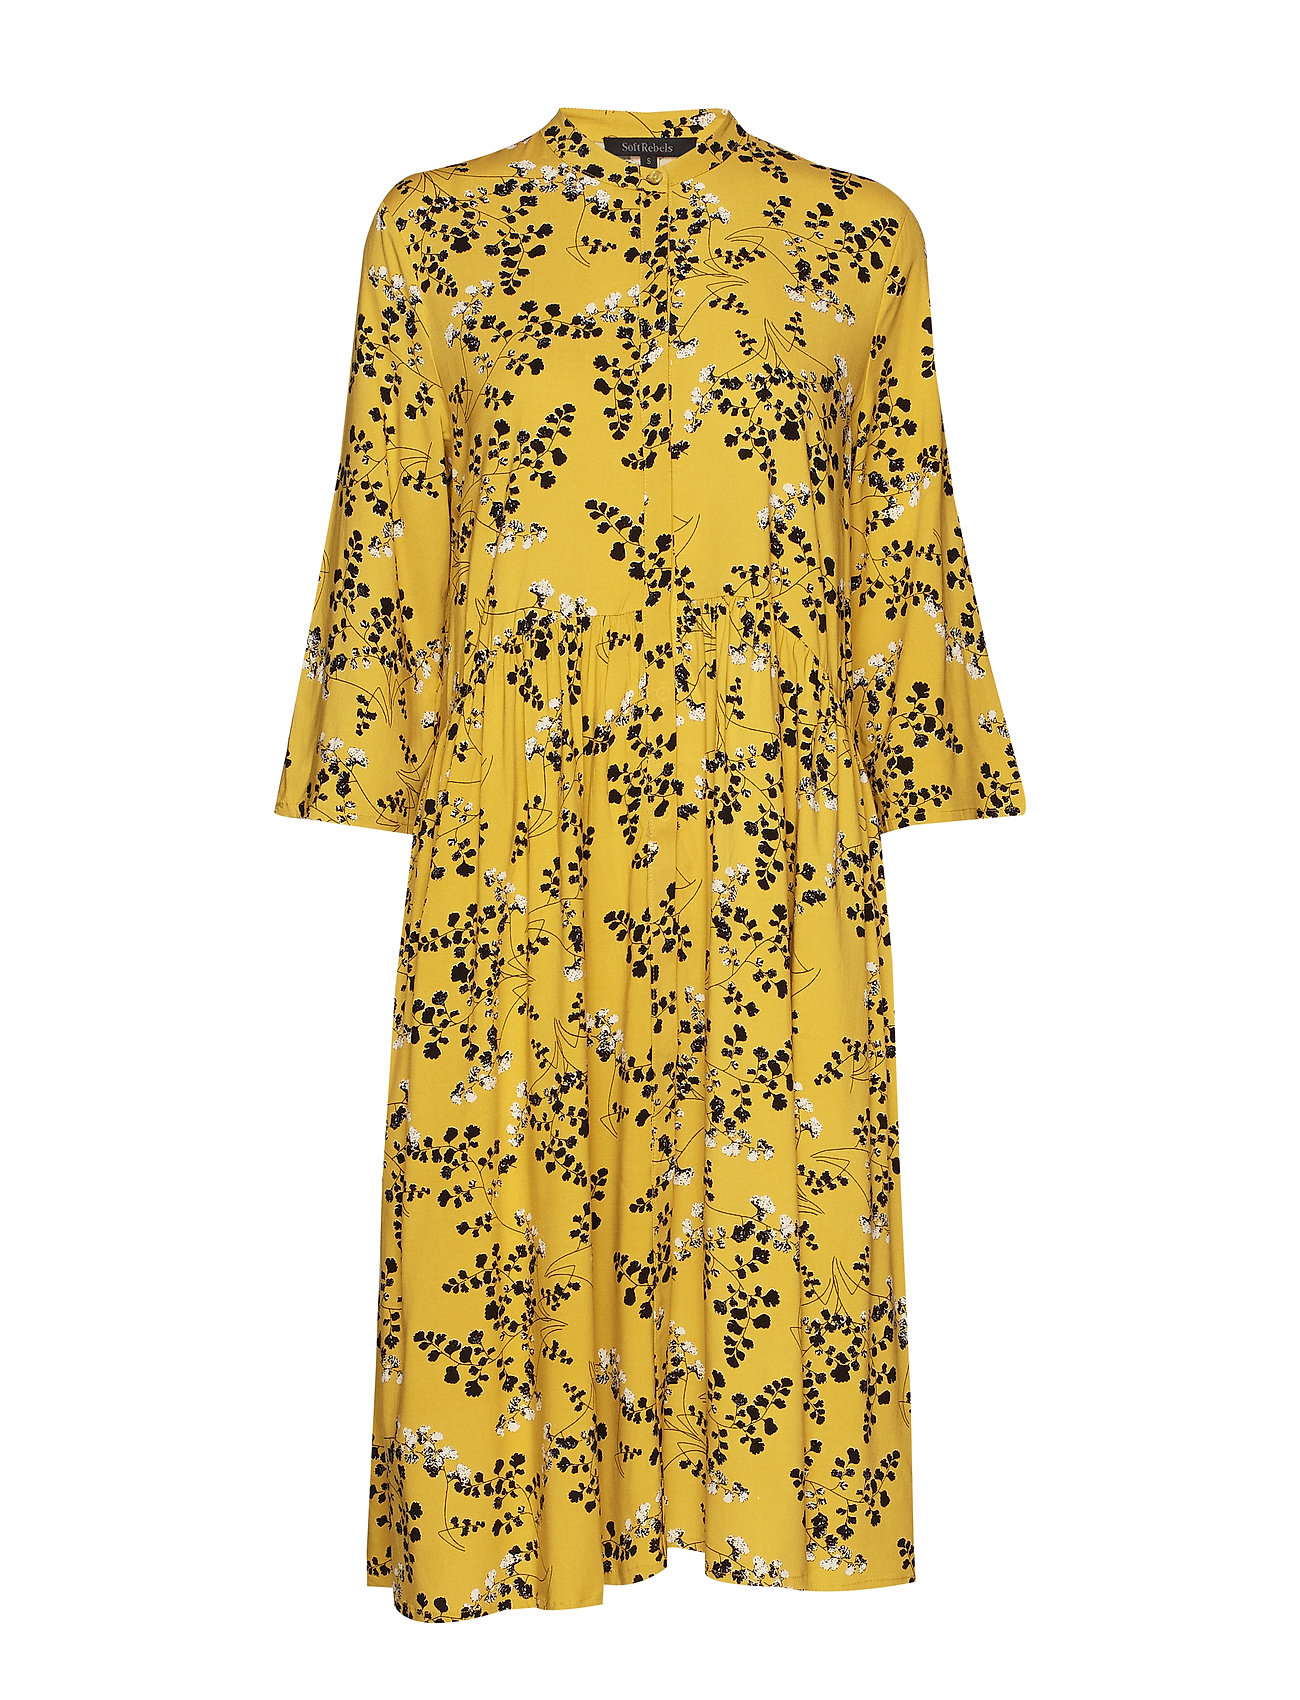 Soft Rebels Karoline Shirt Dress - LEAF PRINT - CEYLON YELLOW